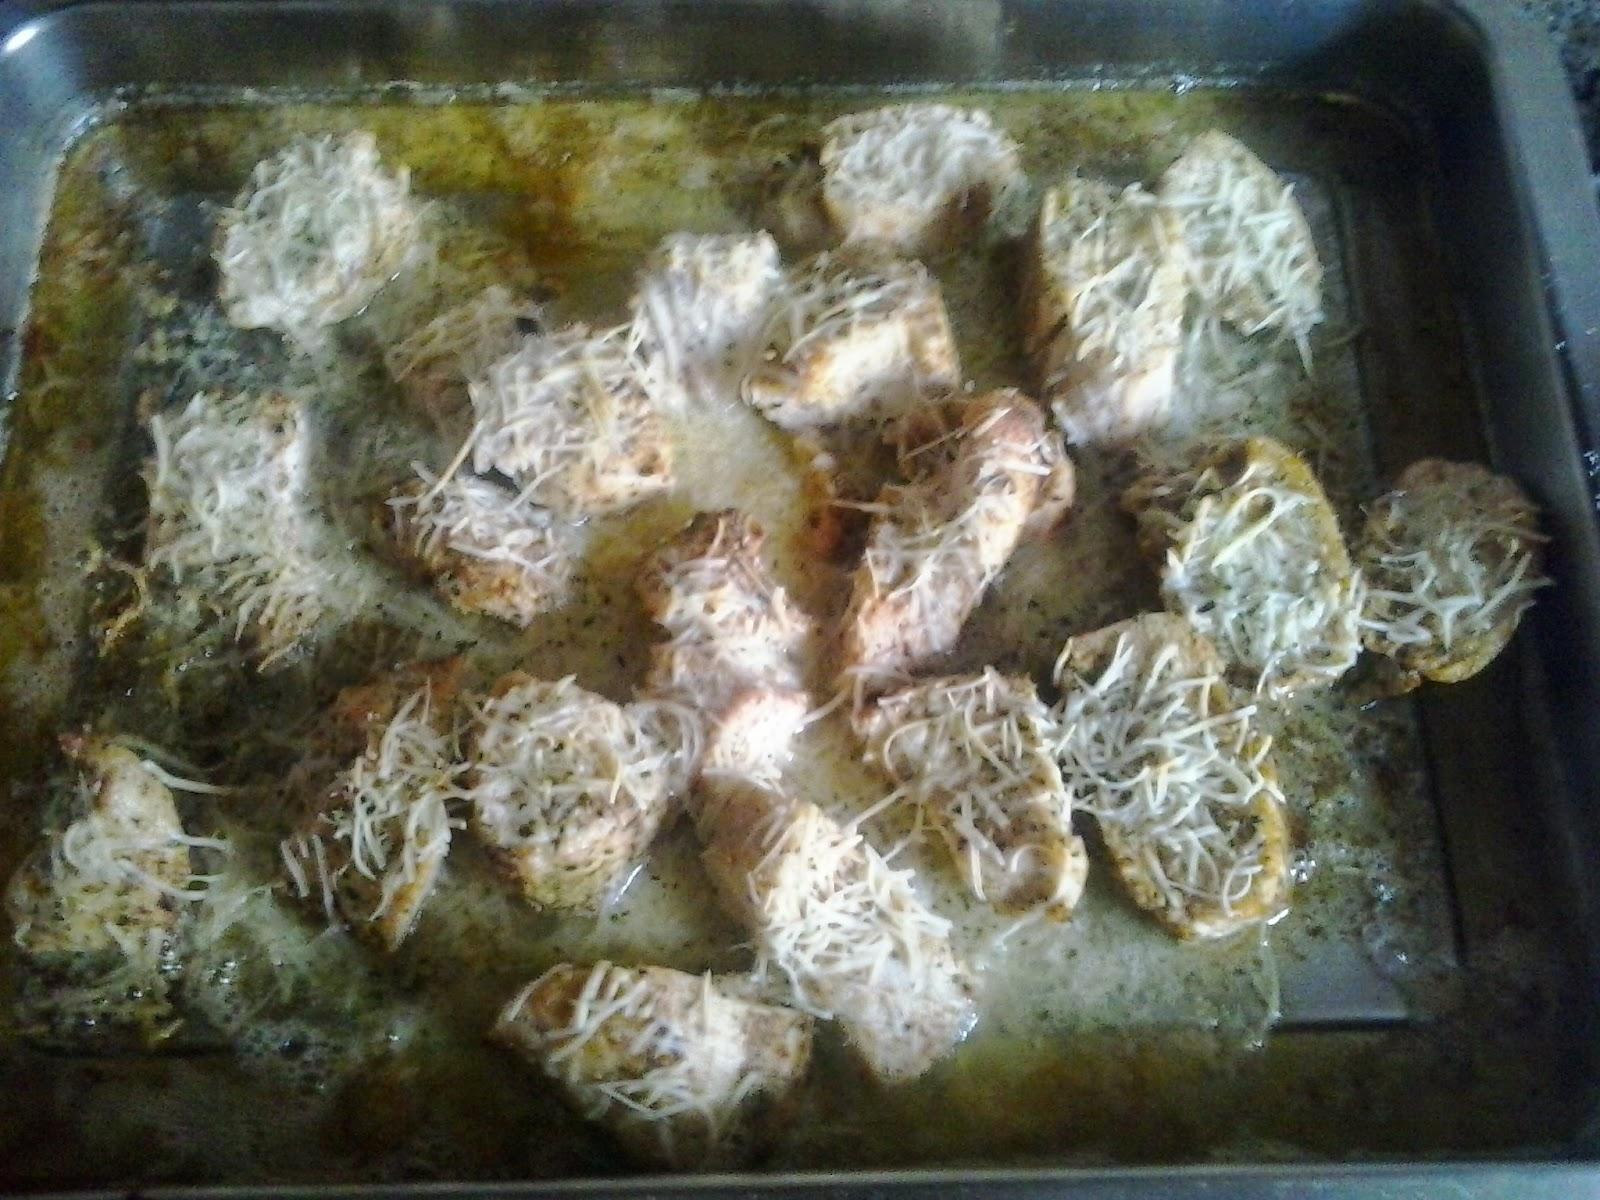 Pechuga de pollo al horno por uno